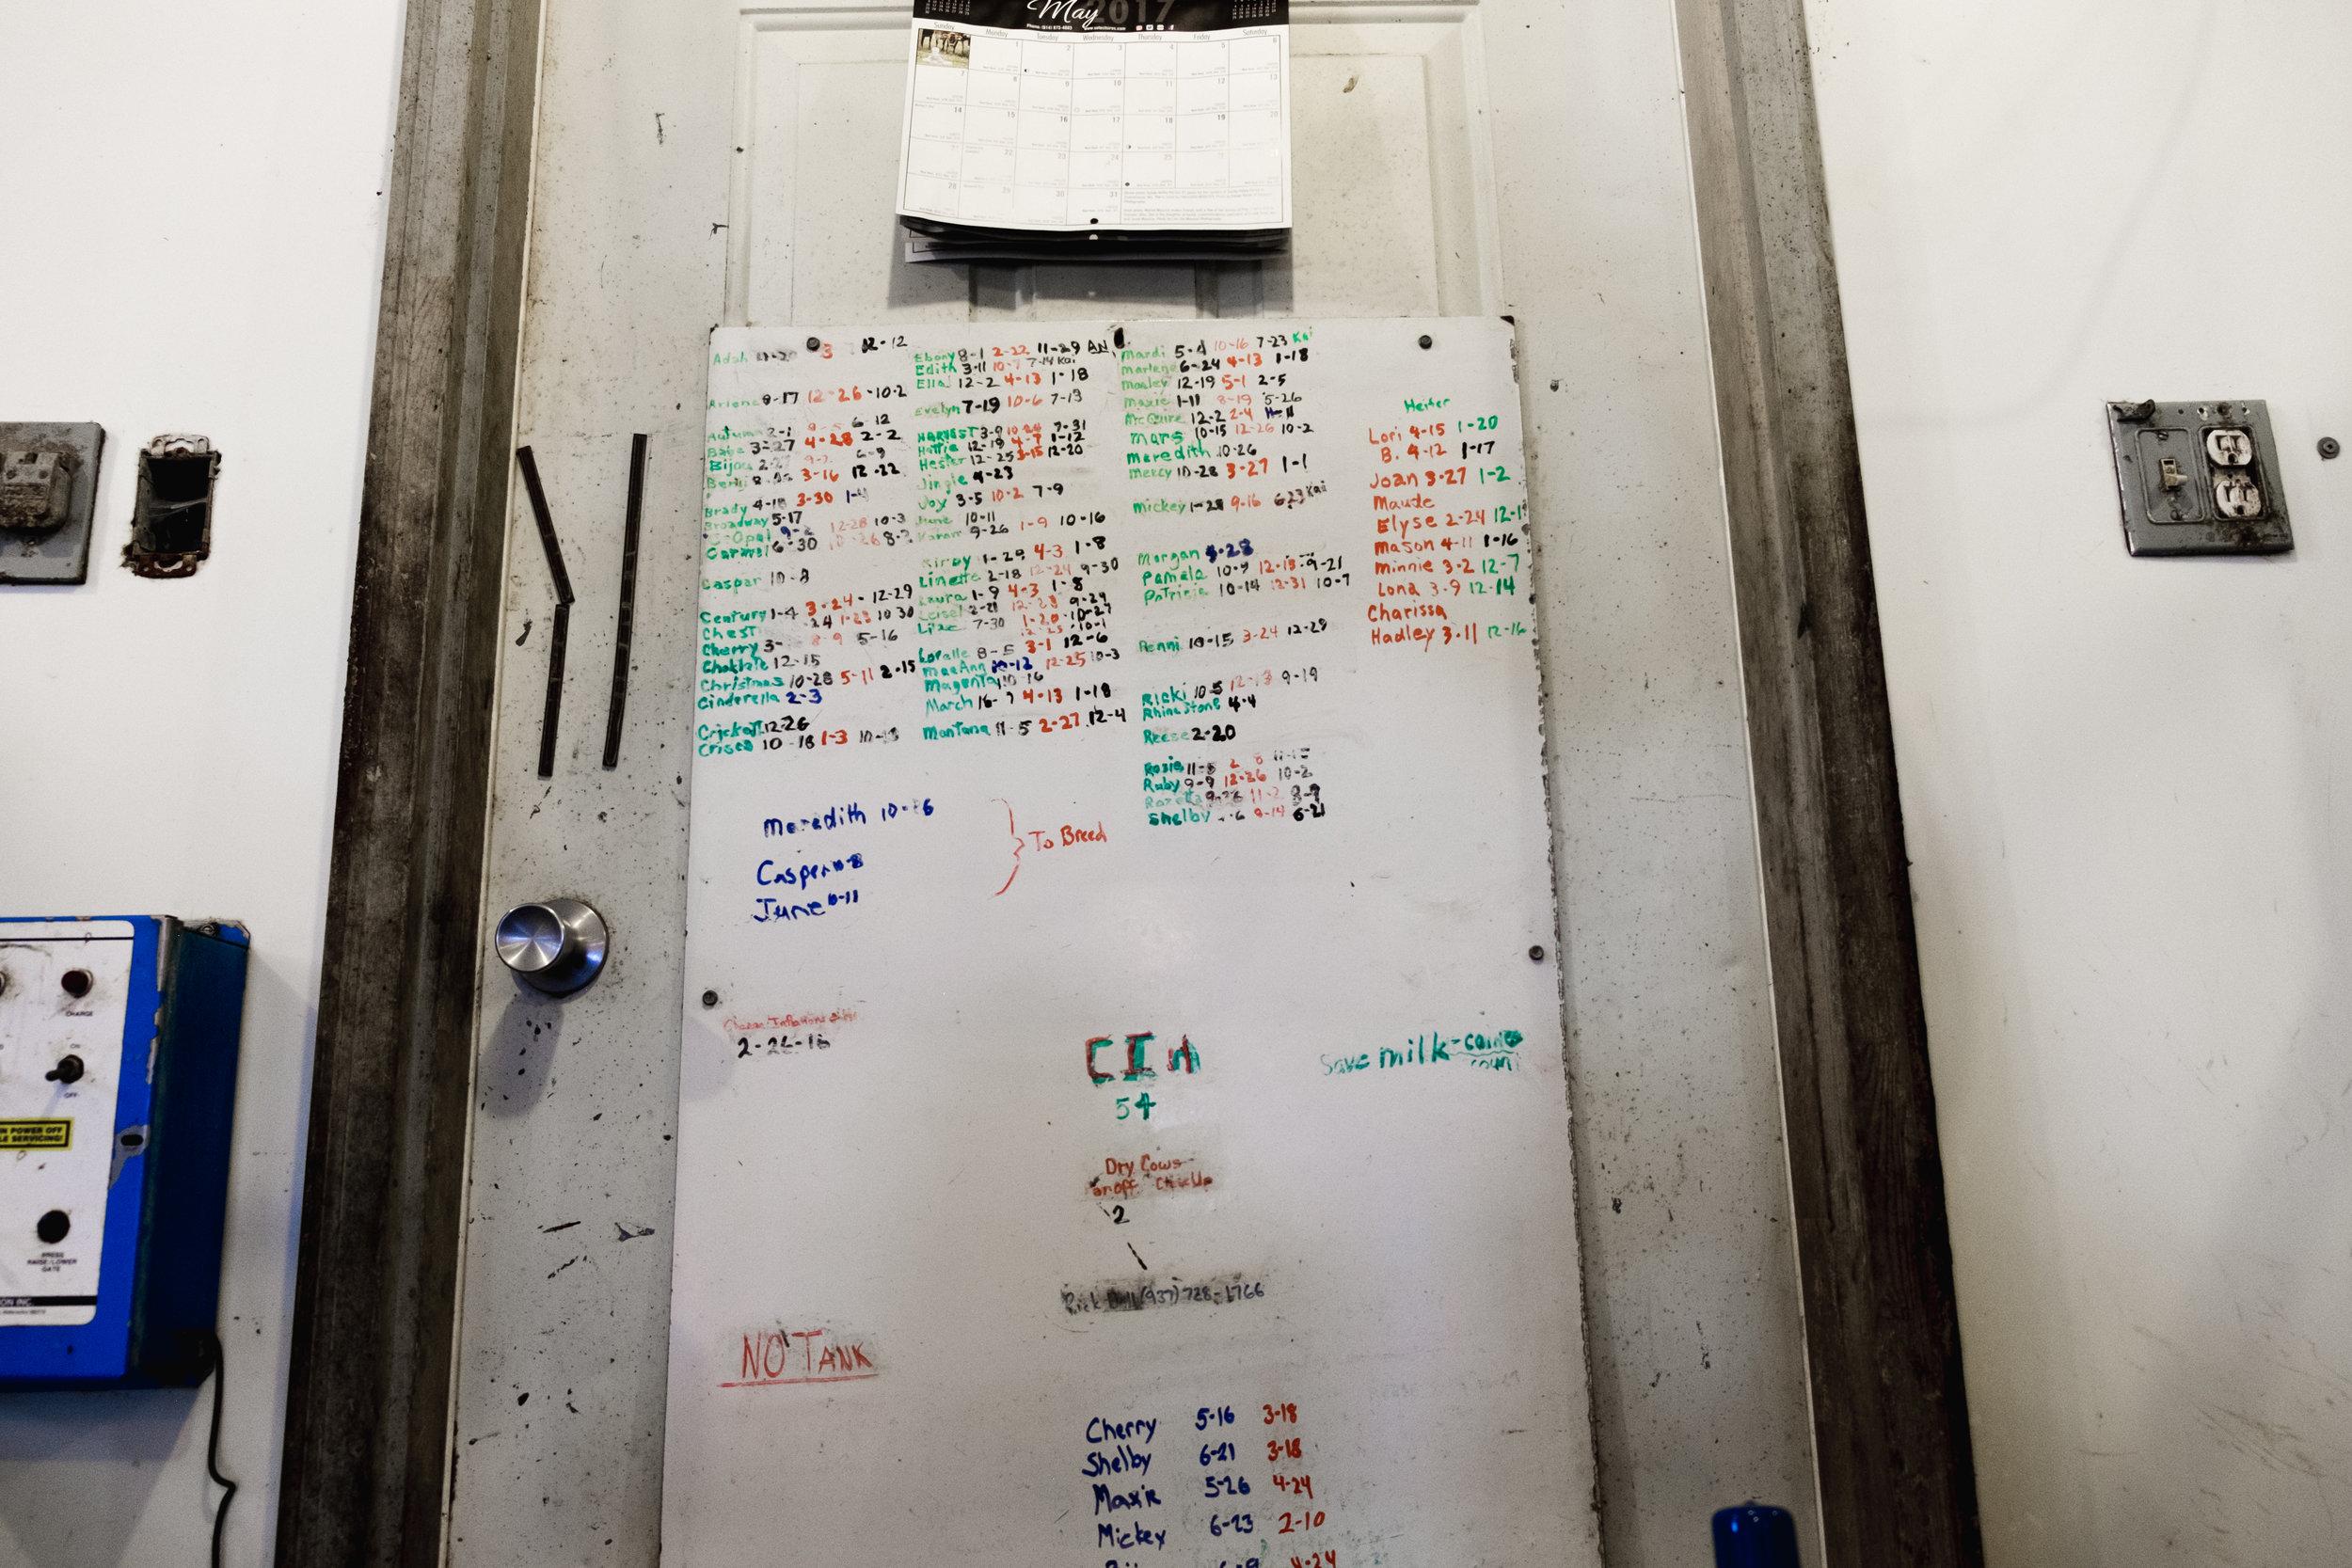 The milking schedule